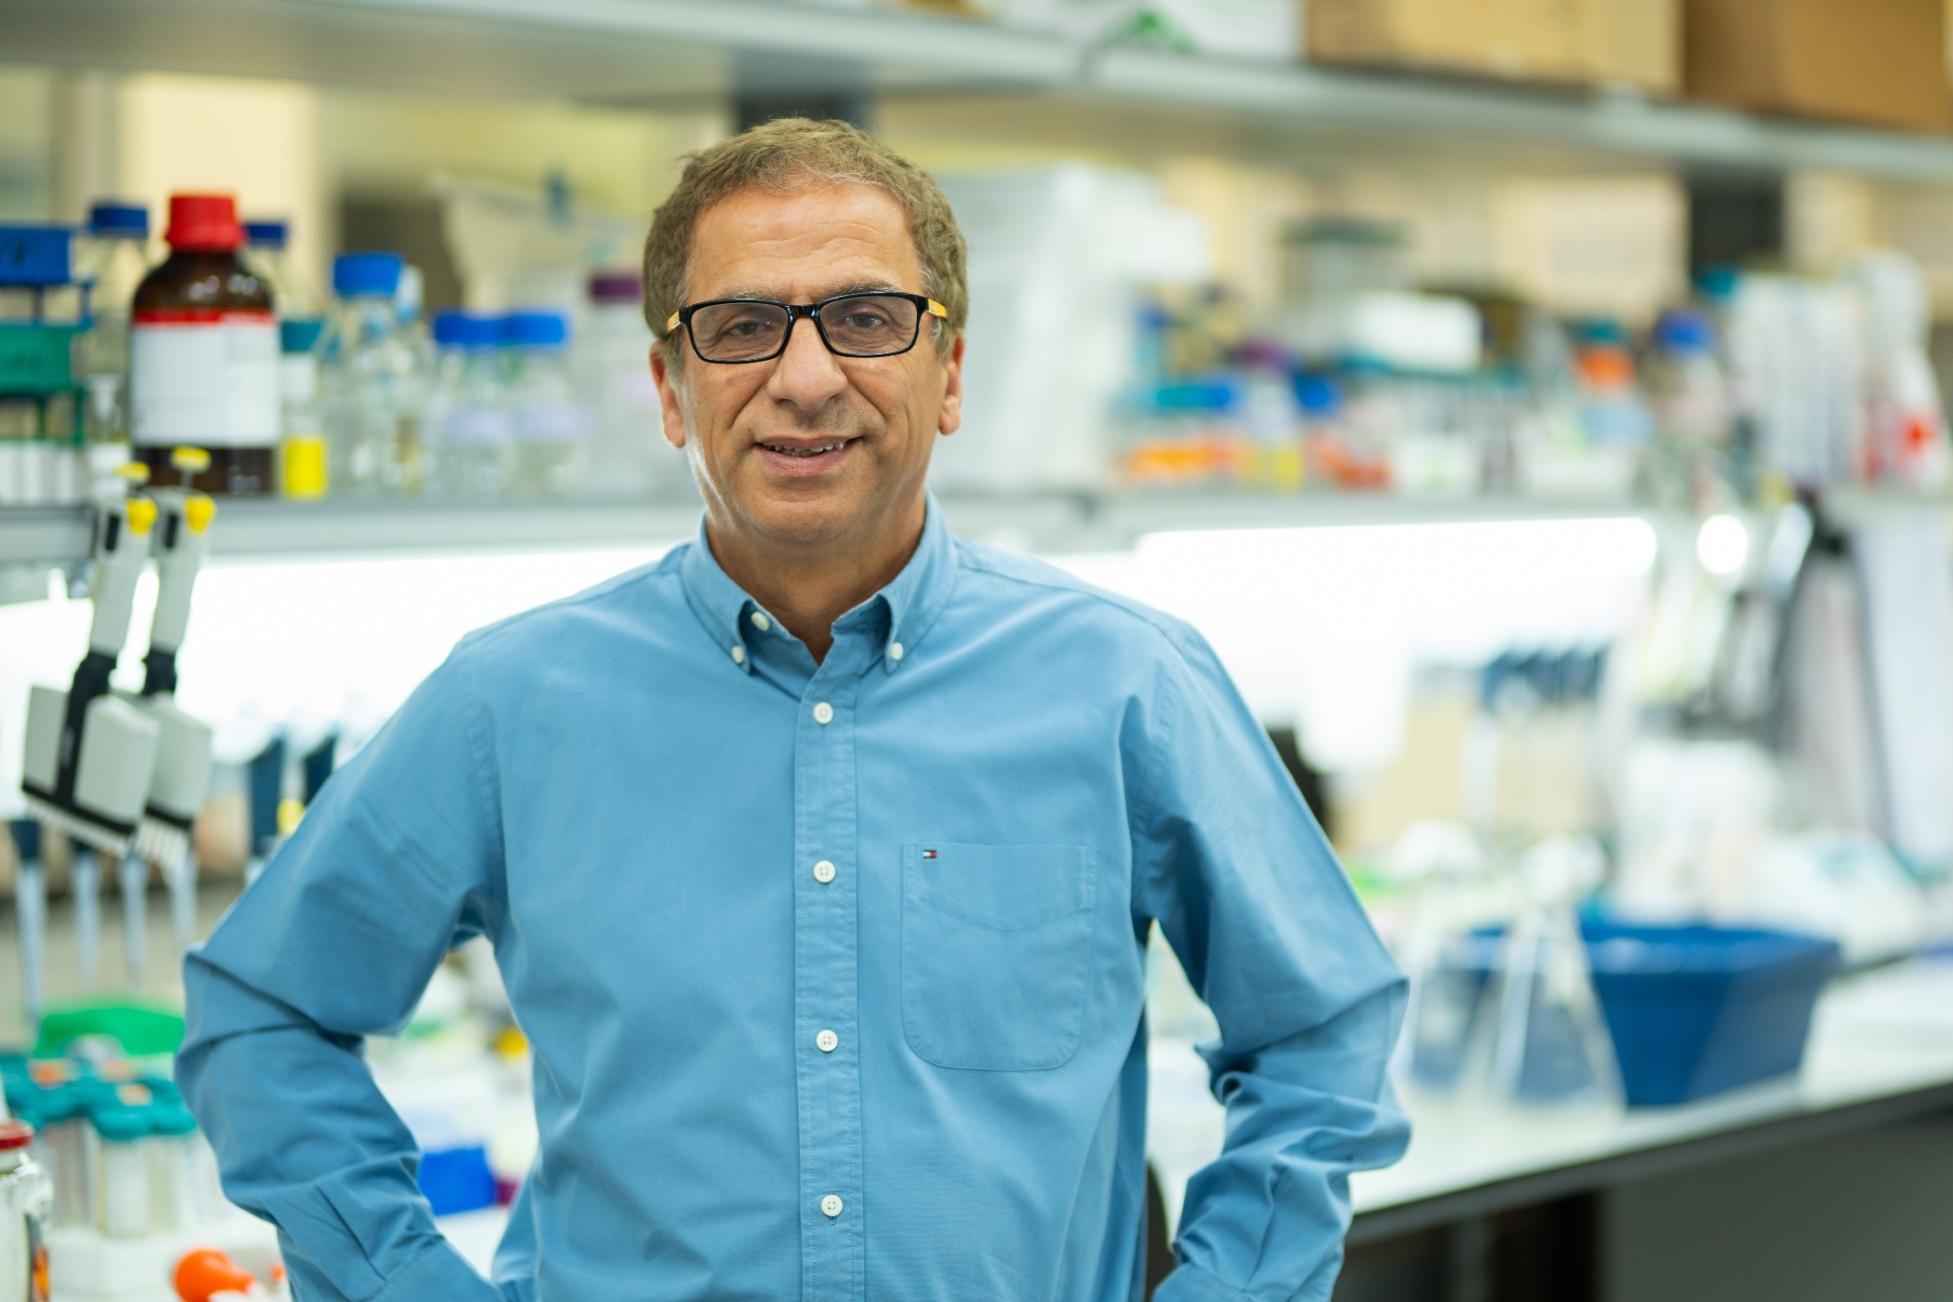 OurCrowd תוביל השקעה של 12 מיליון דולר  לפיתוח חיסון נגד קורונה